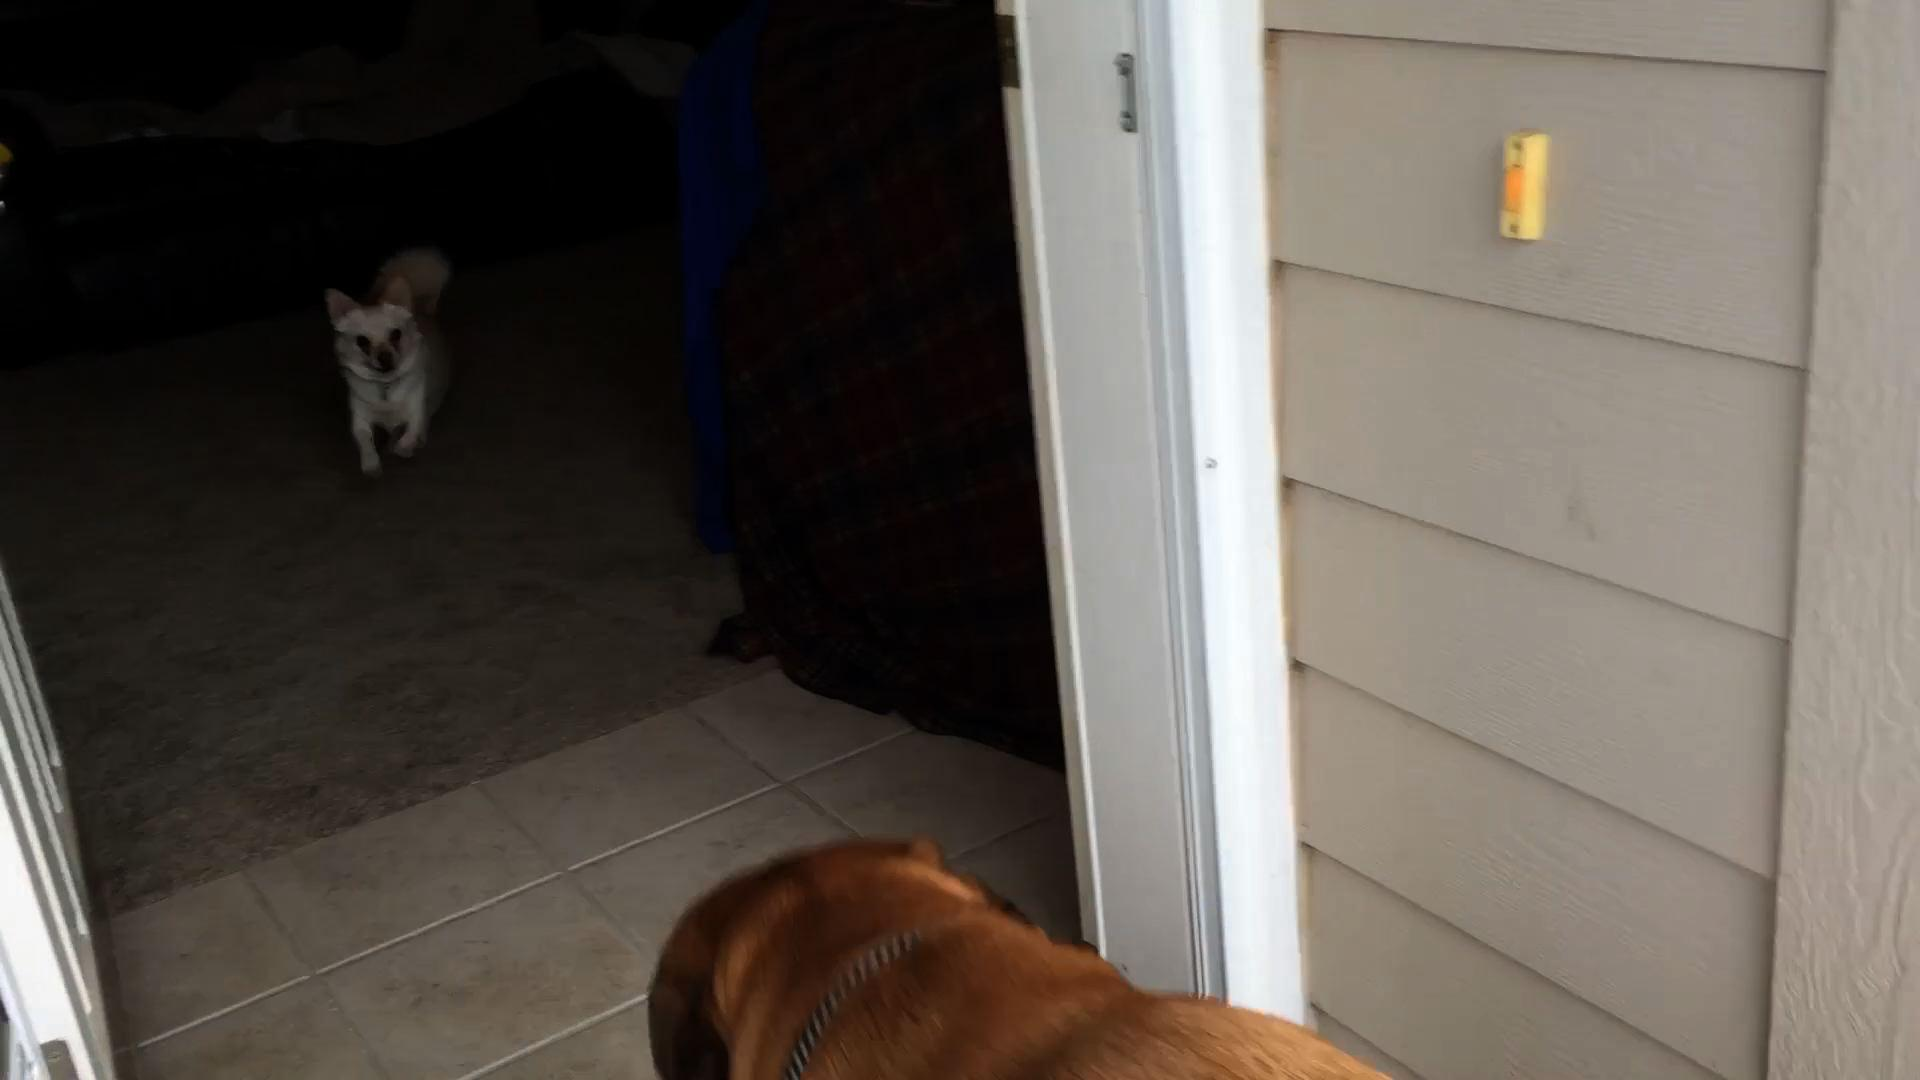 Giant Dog Vs. Tiny Dog